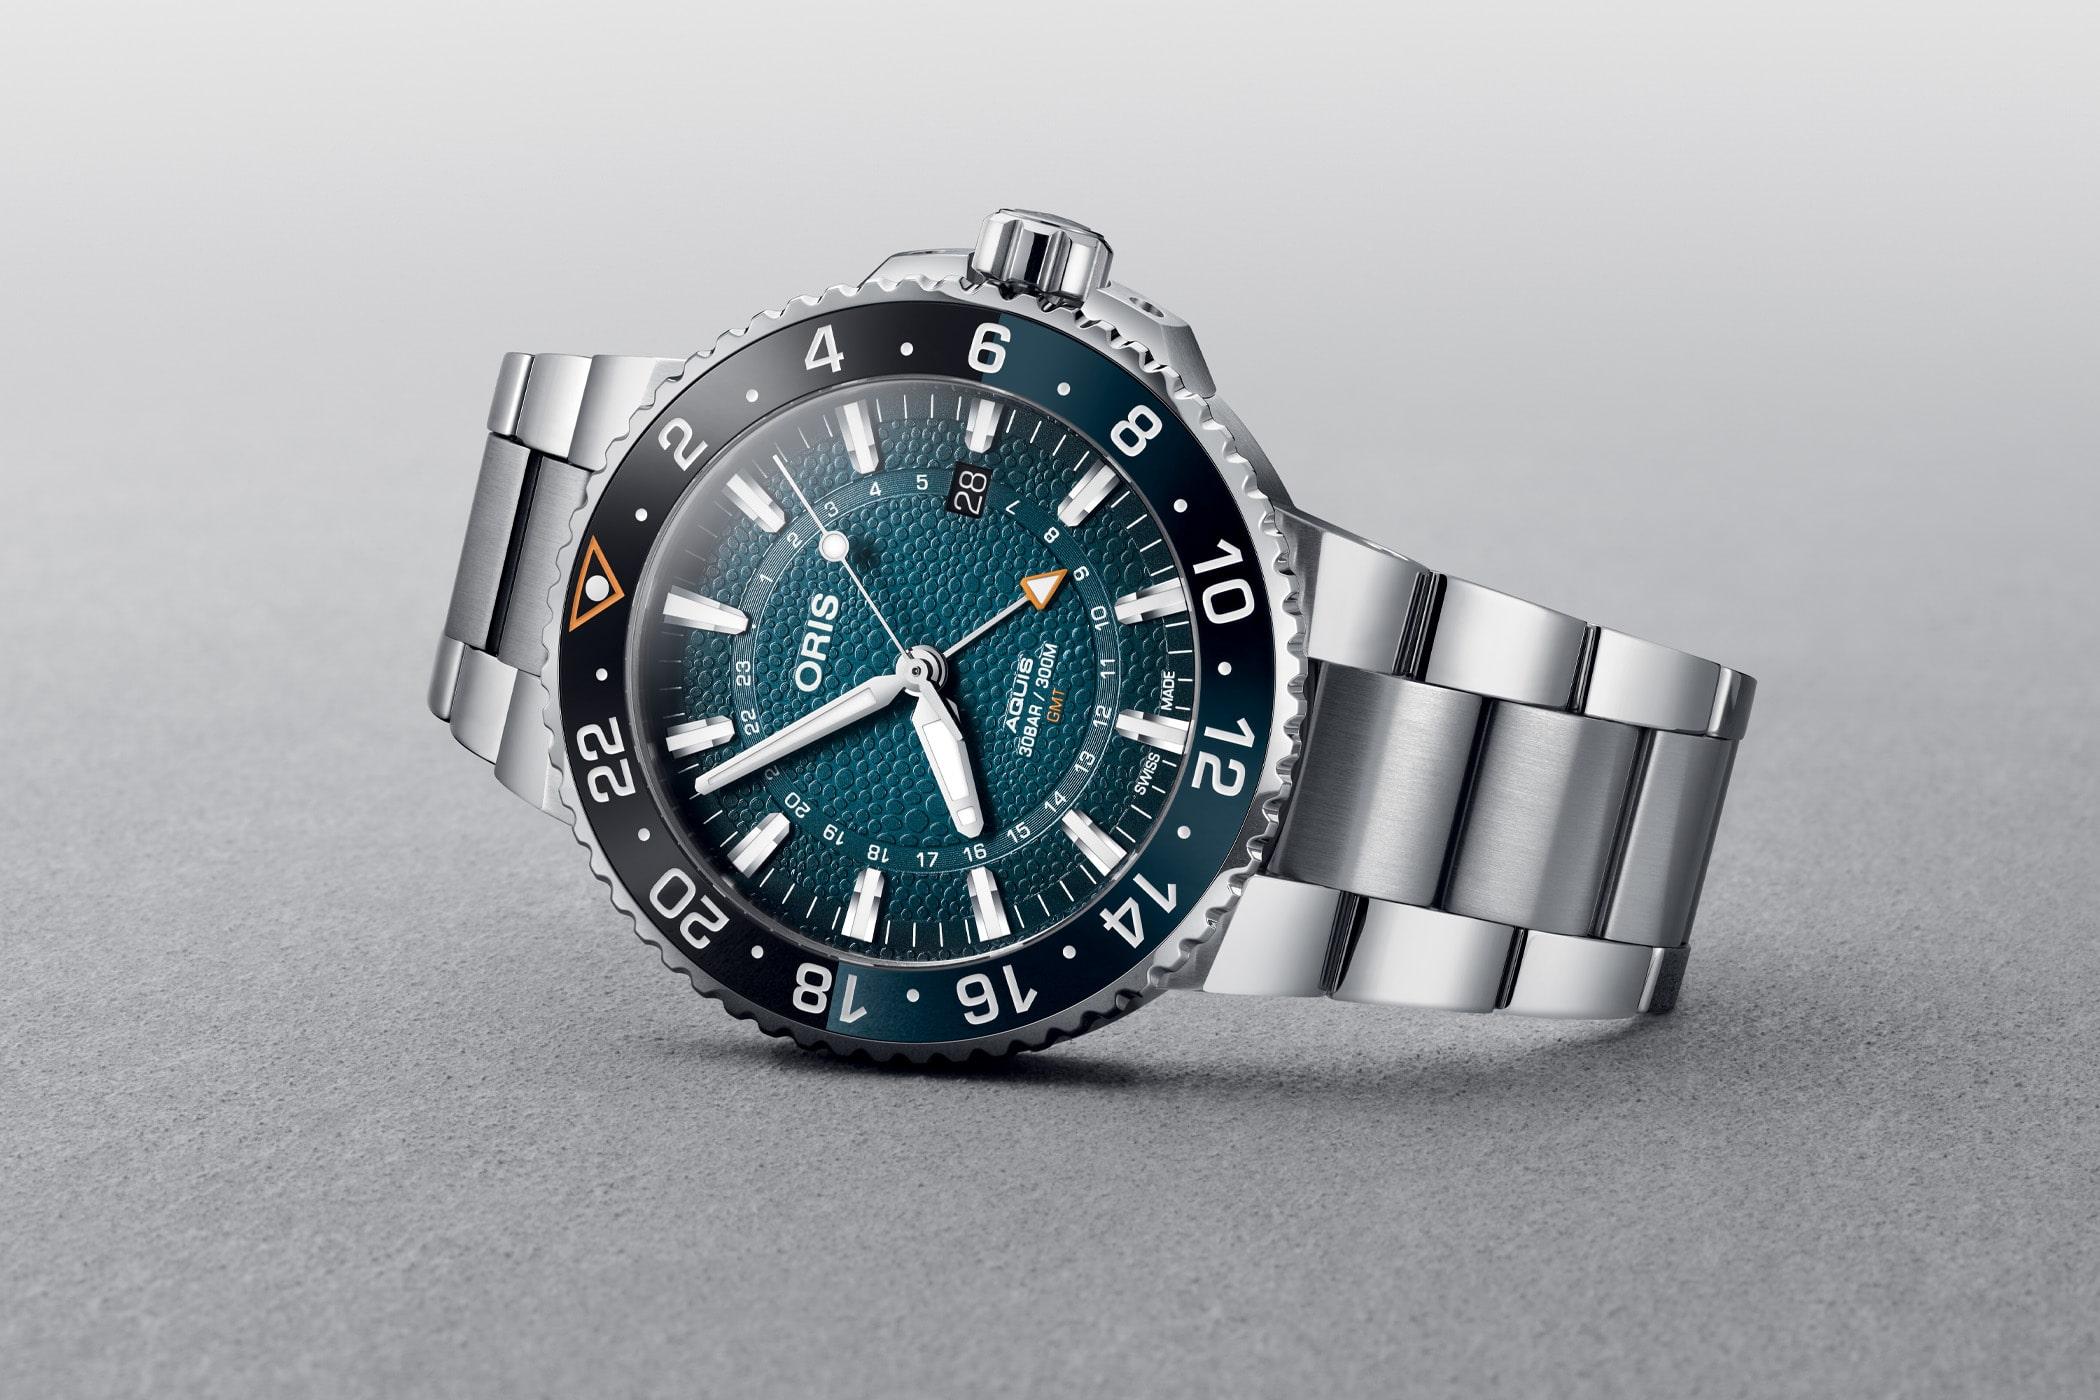 Oris Aquis GMT Date Whale Shark Limited Edition 01 798 7754 4175 Set 1 min